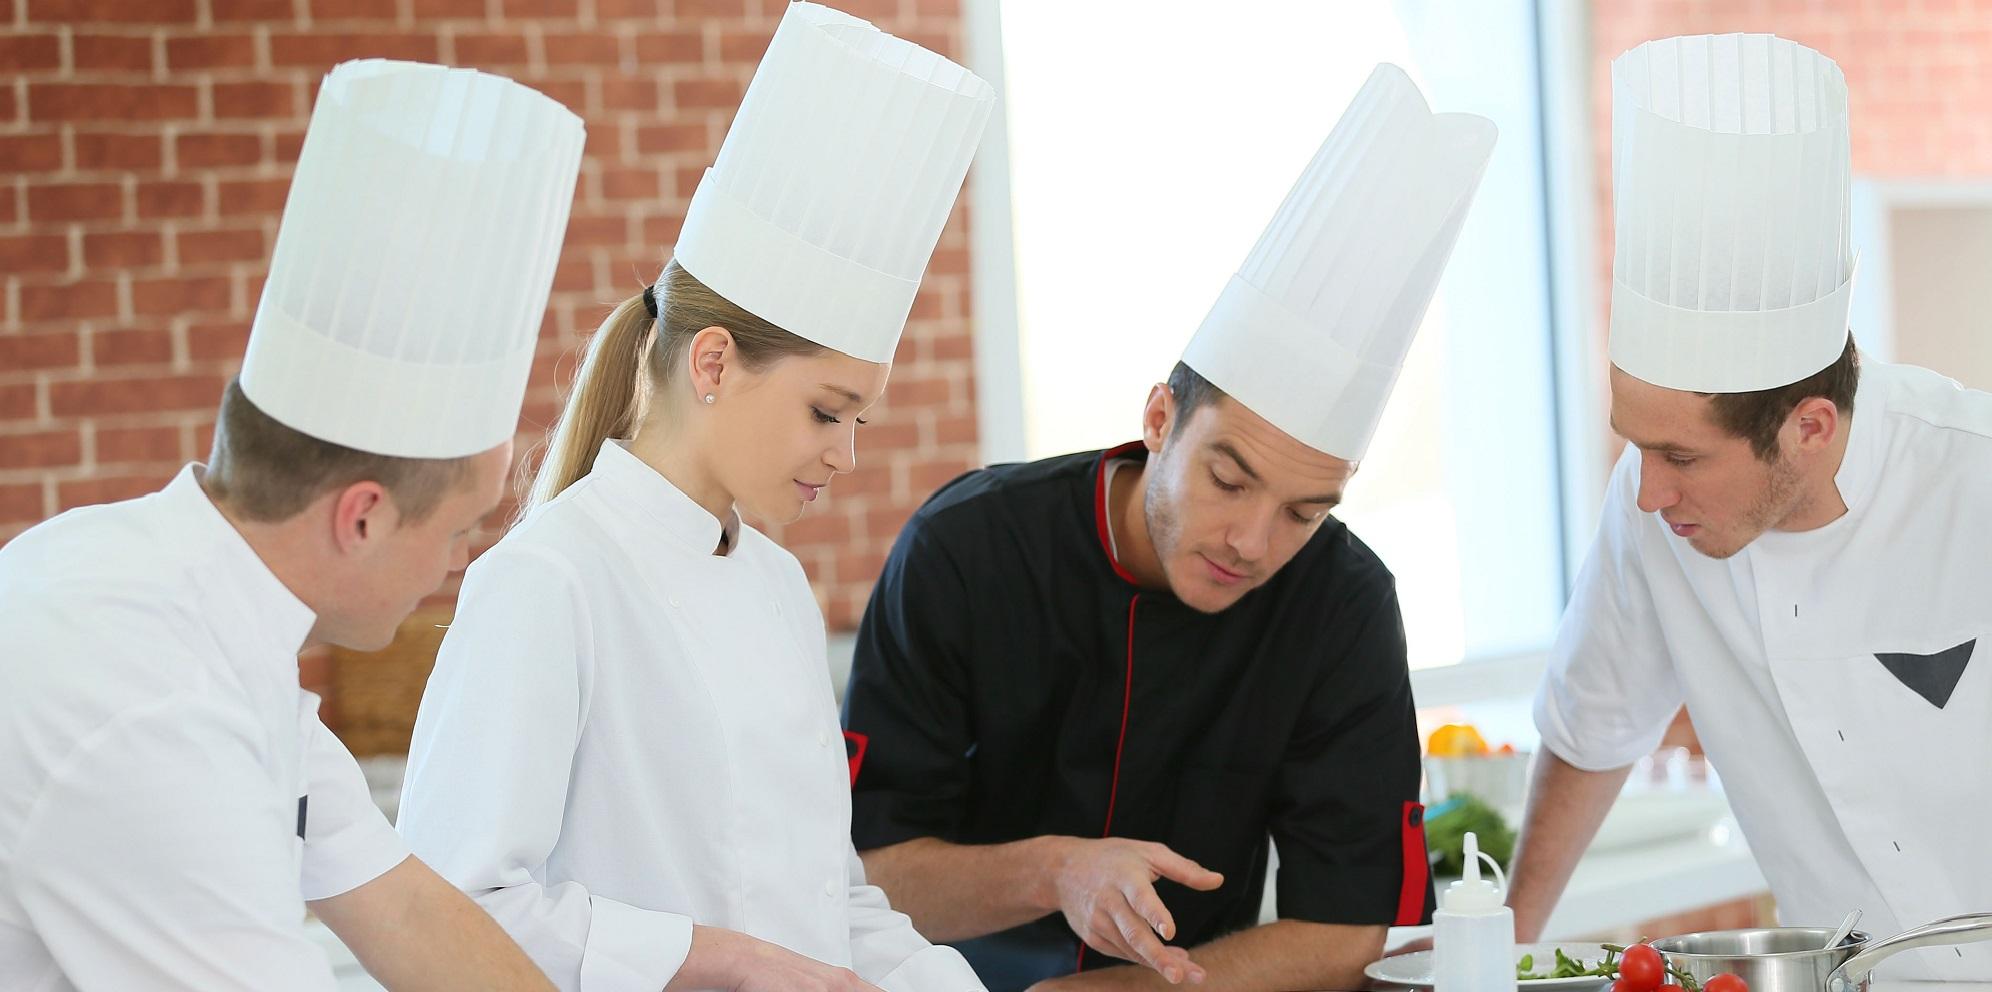 idiomas-aprender-chef-portada